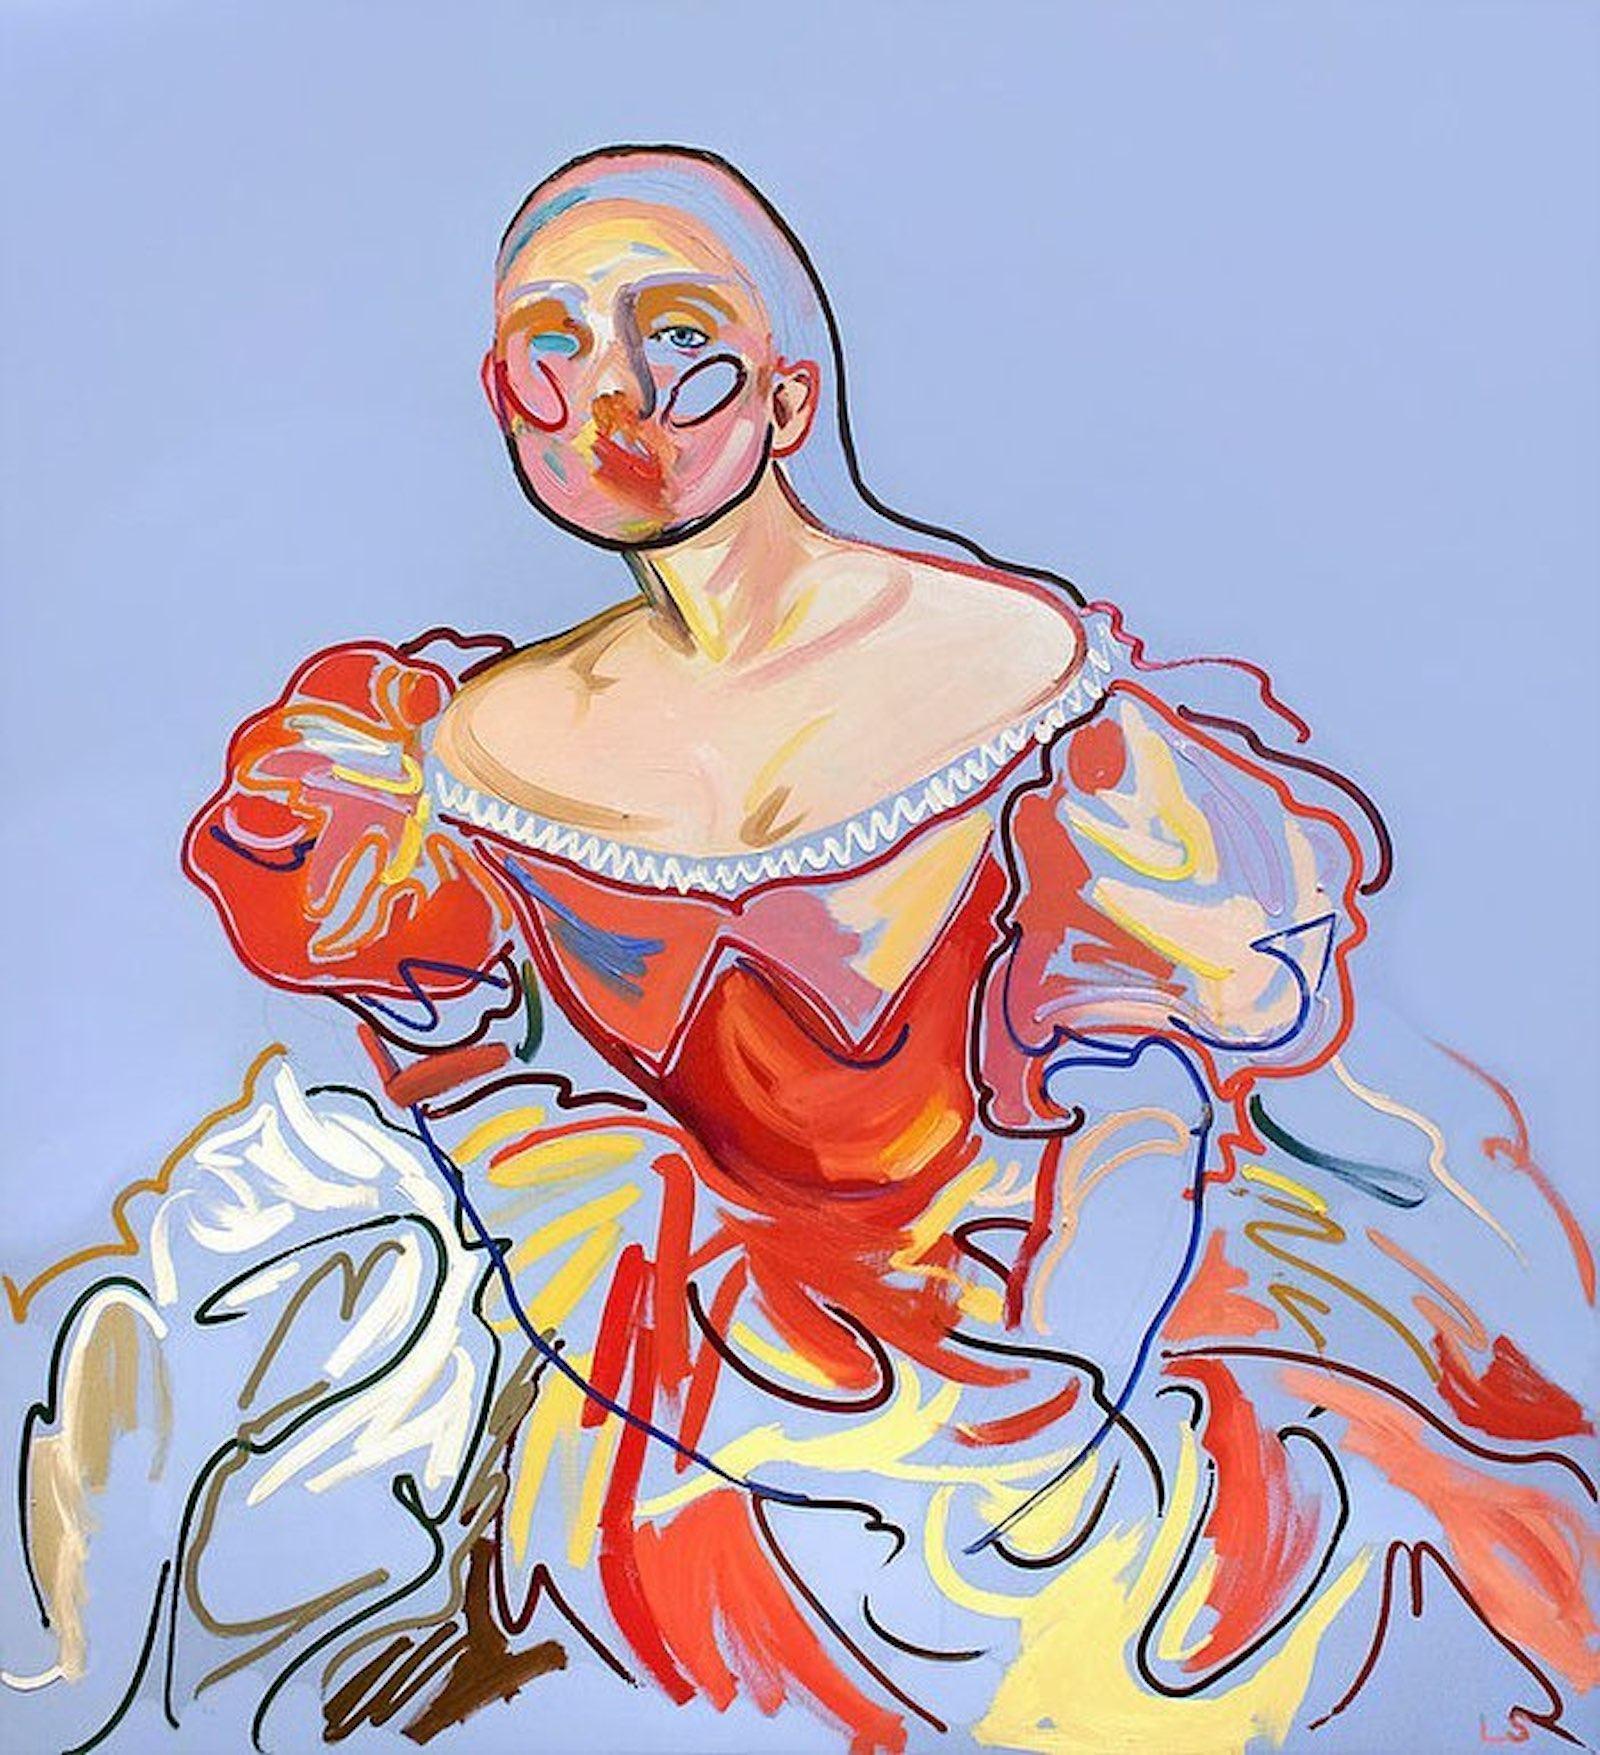 iGNANT-Art-Loribelle-Spirovski-003